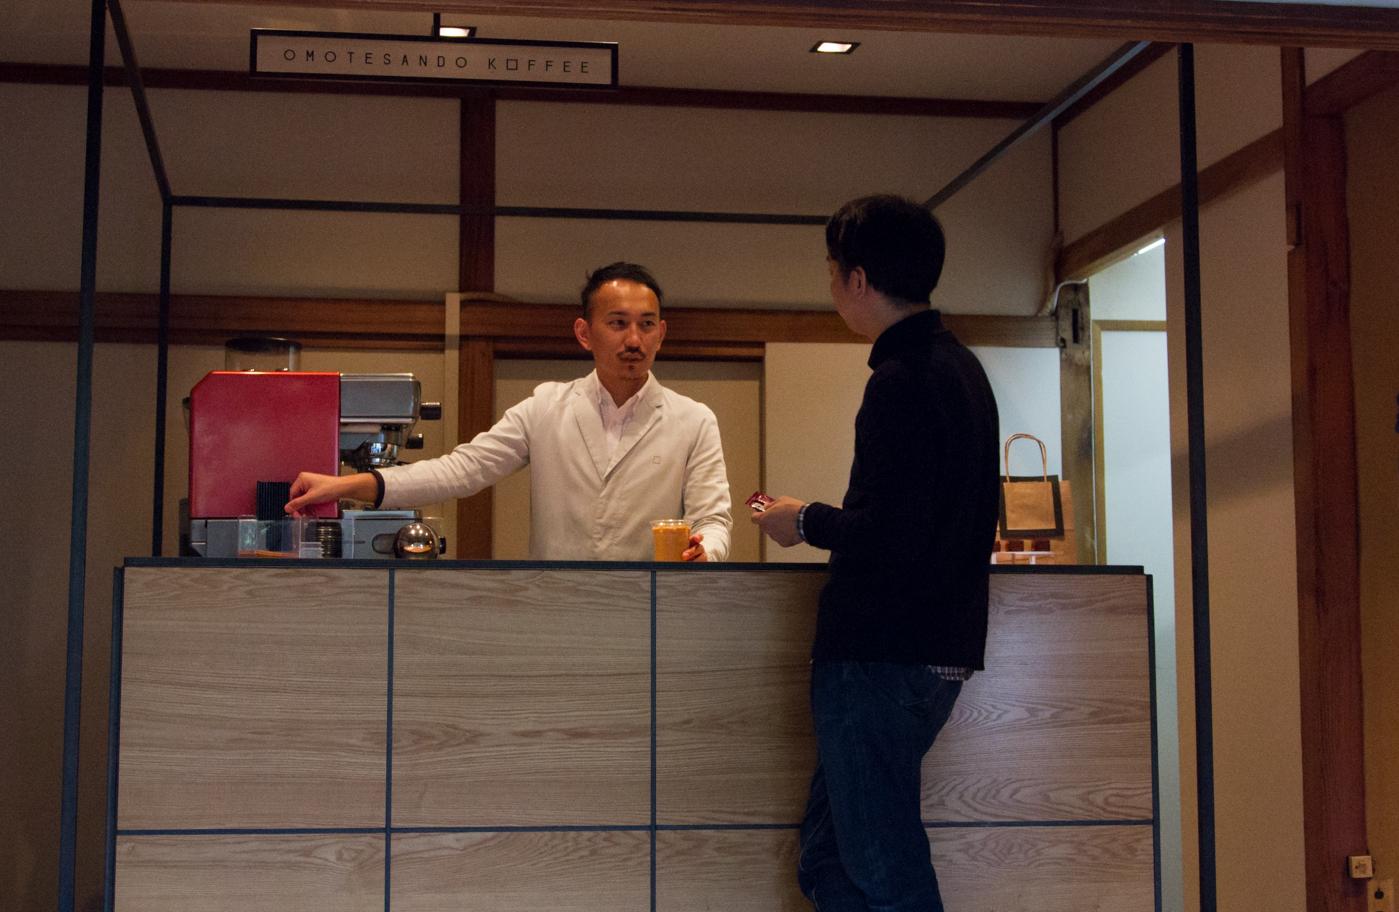 omotesando koffee counter where japanese barista is talking to customer